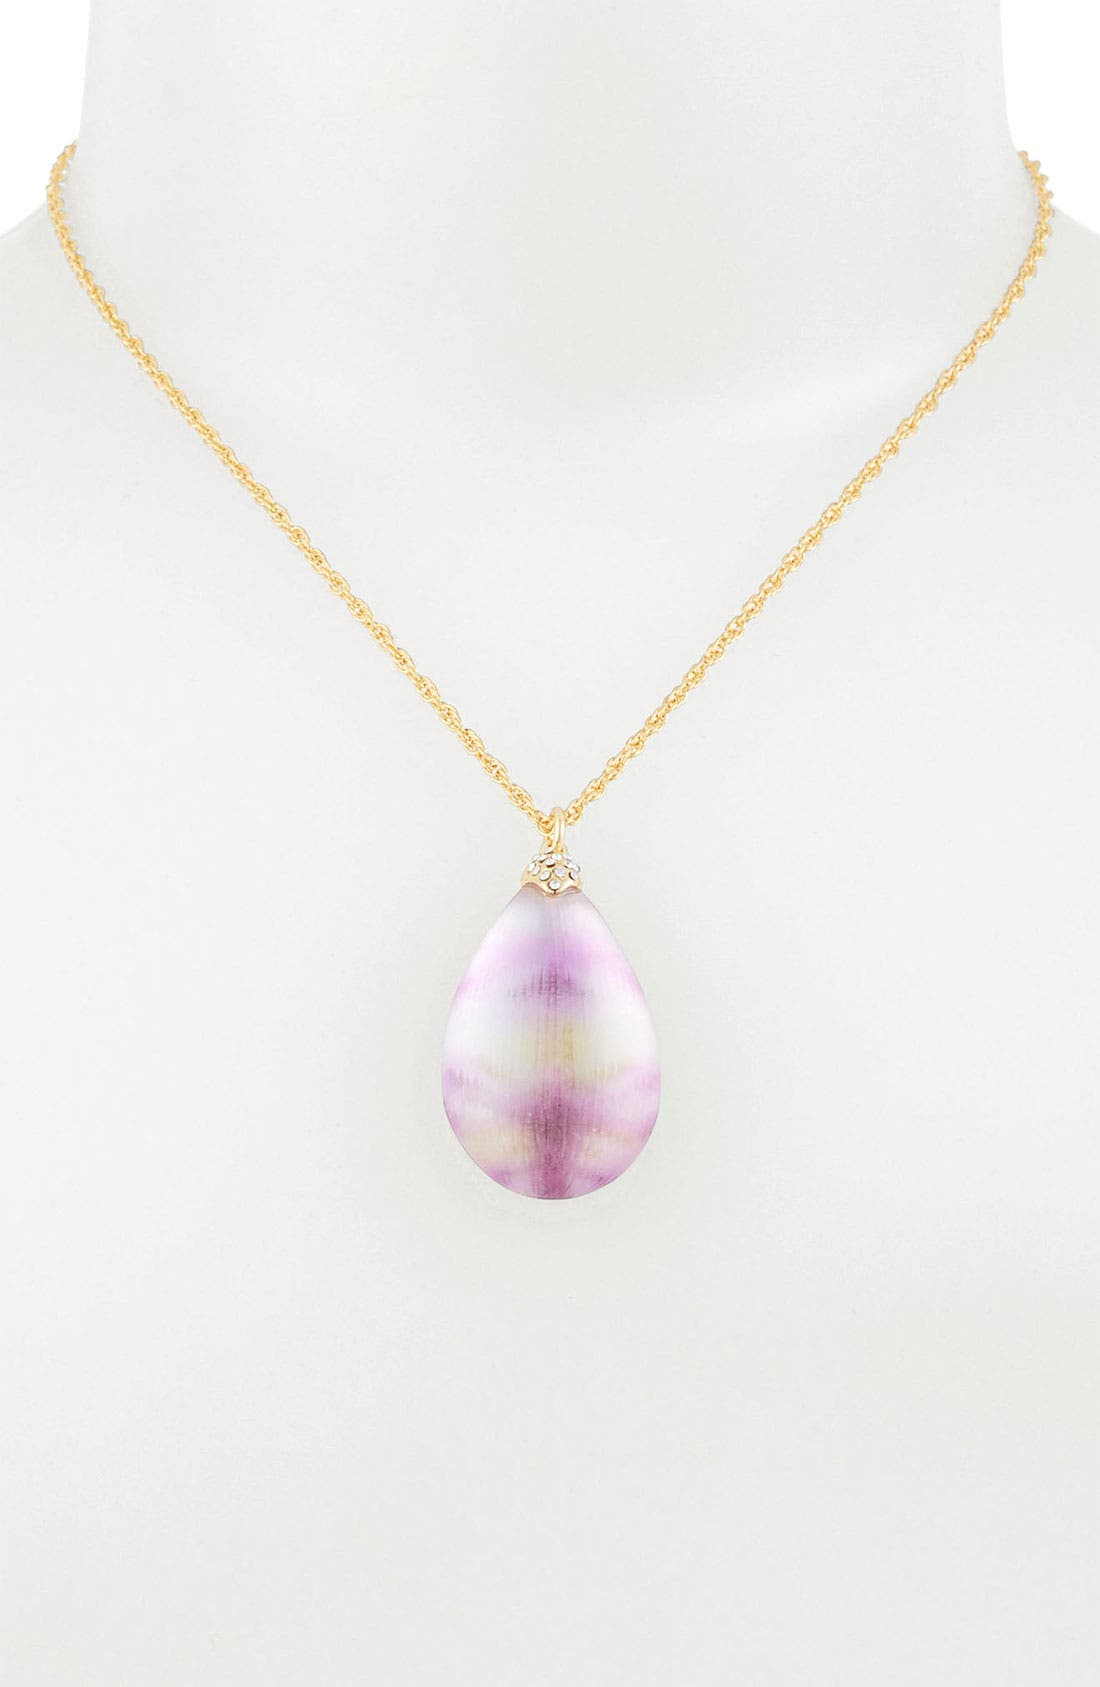 Main Image - Alexis Bittar 'Lucite® - Ophelia' Pendant Necklace